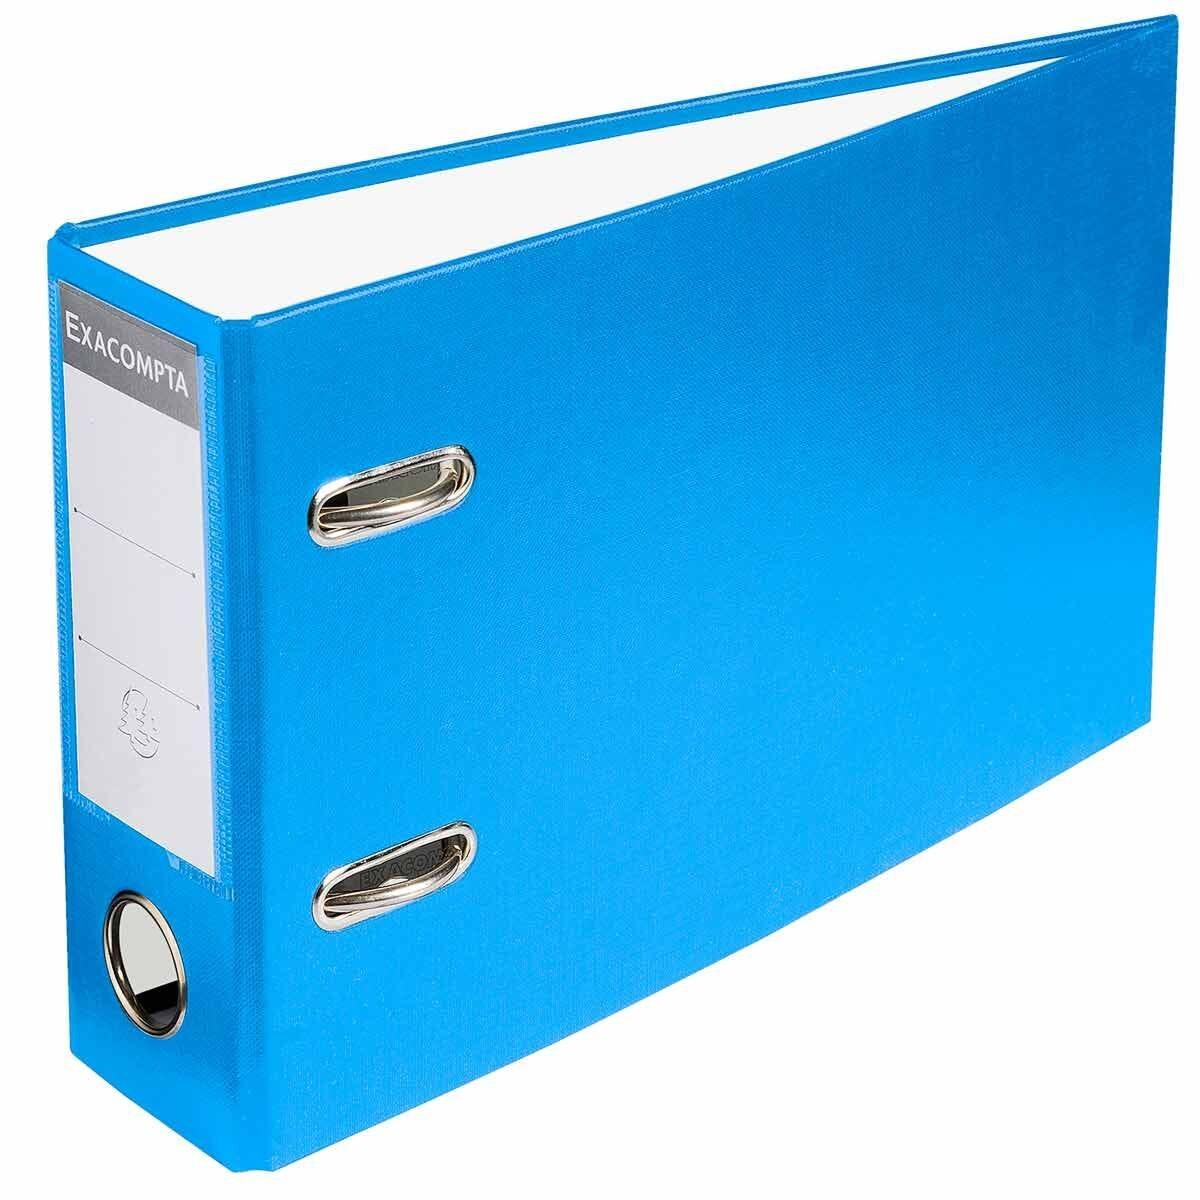 Exacompta Lever Arch File A5 Landscape 70mm Pack of 10 Blue